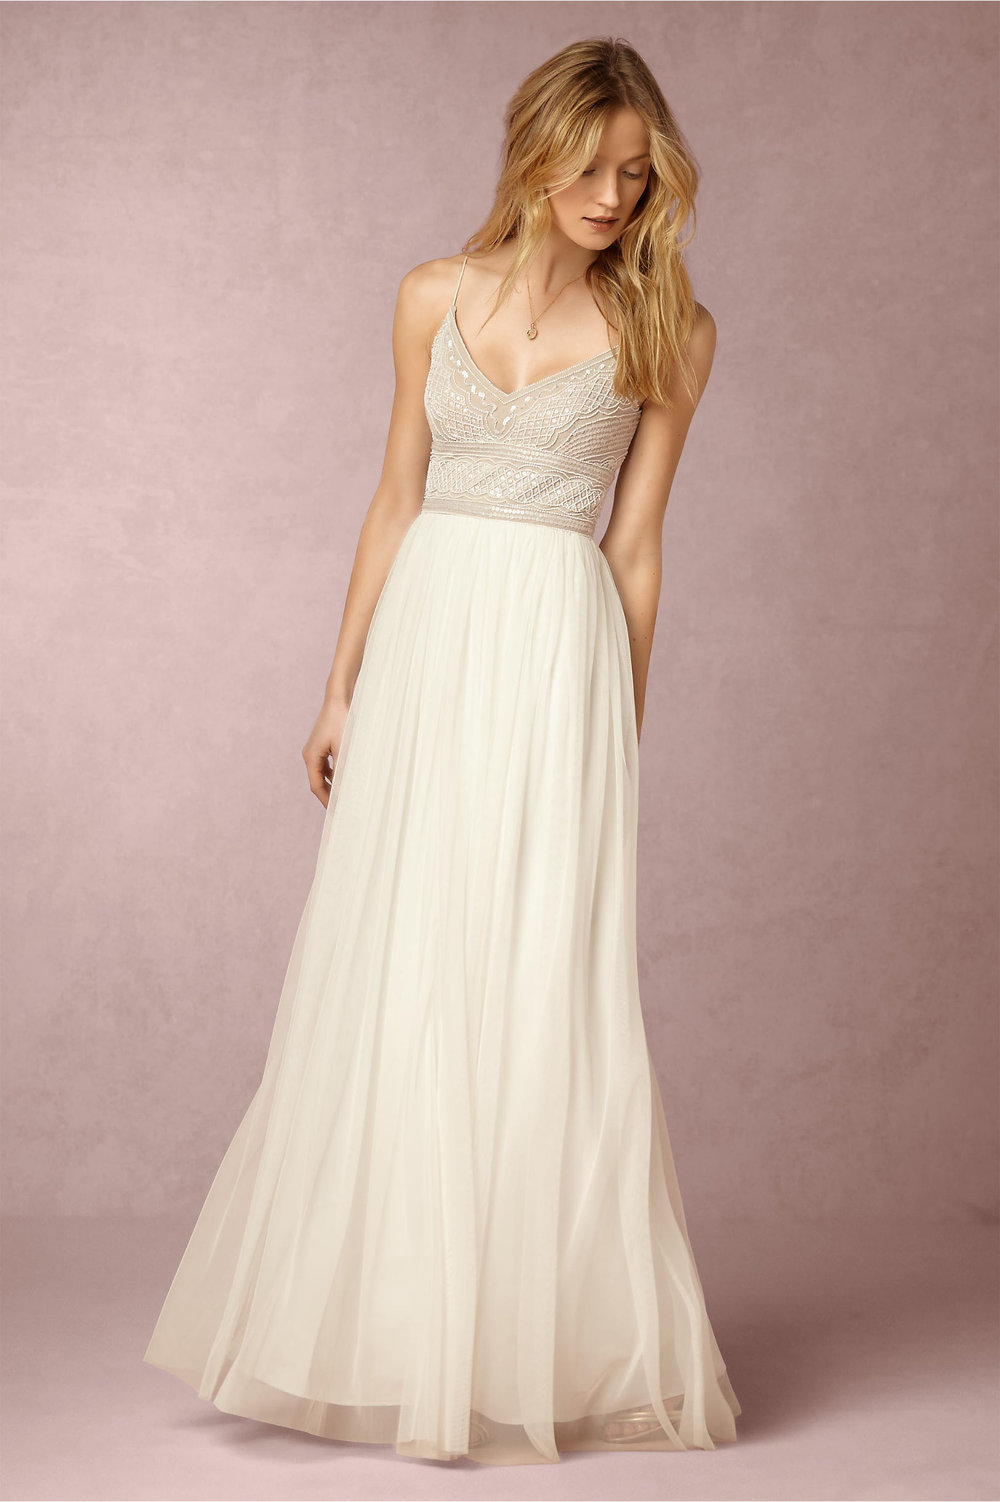 Naya Dress $350